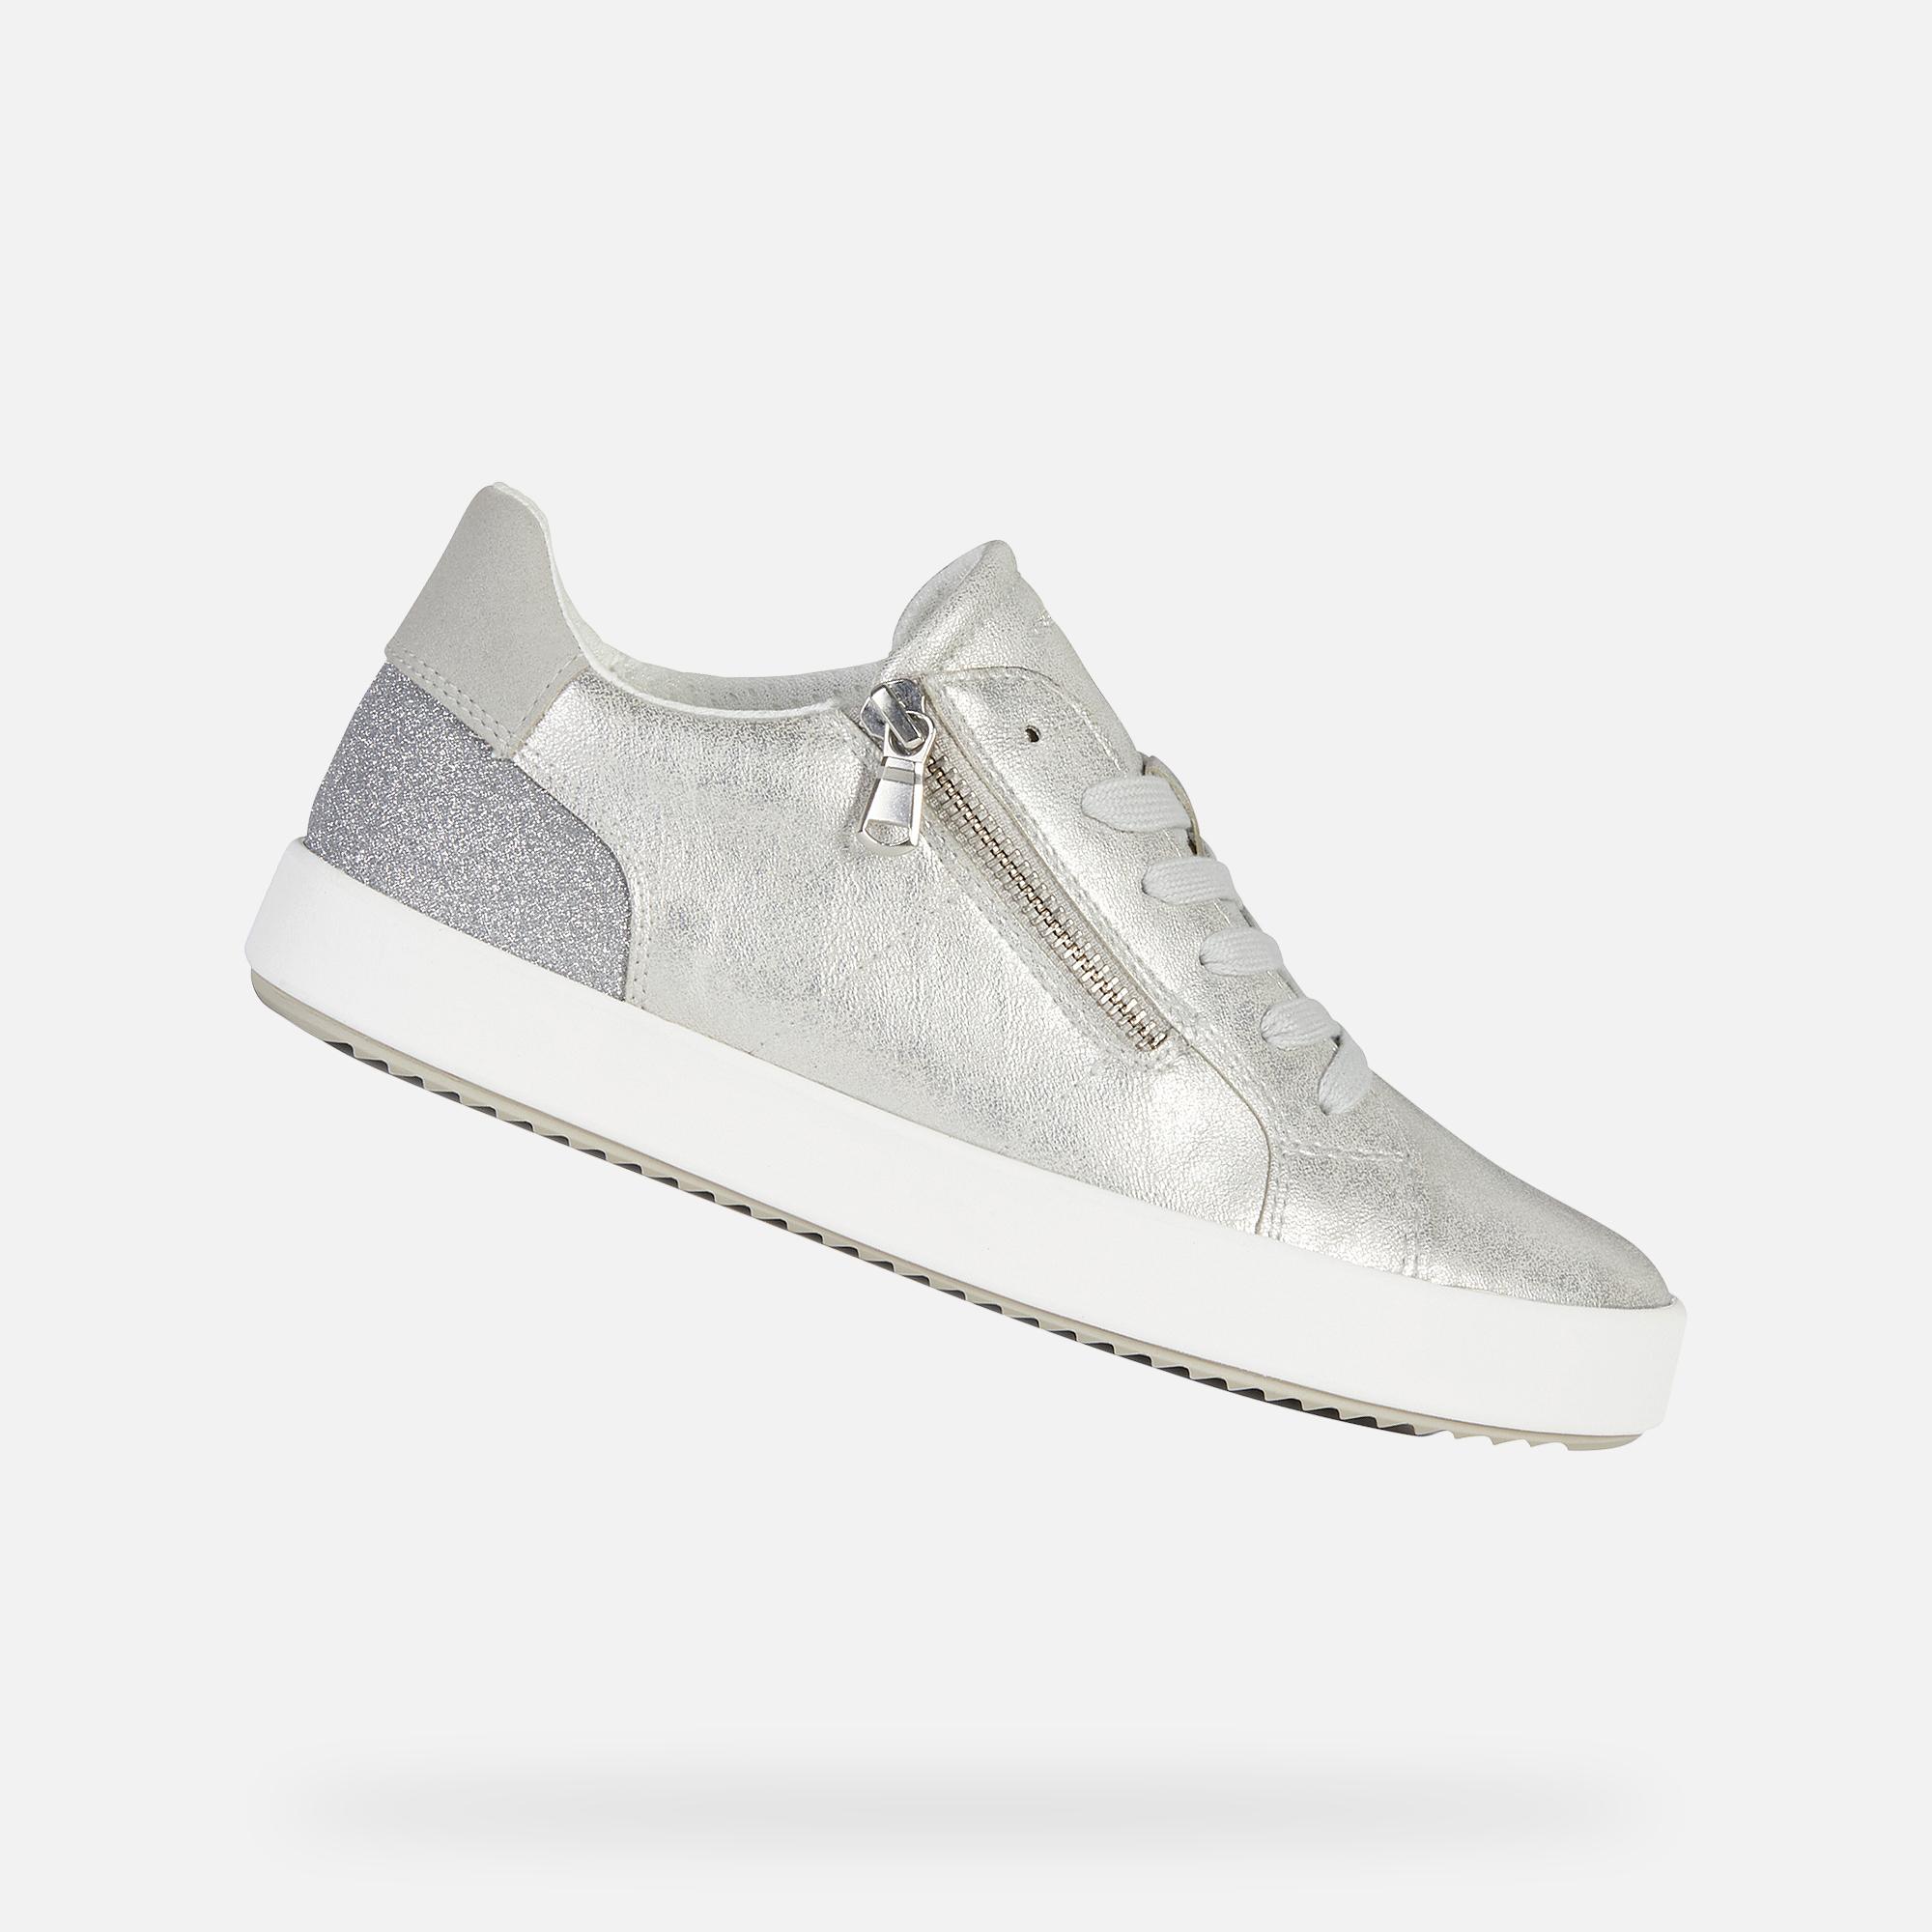 Geox BLOMIEE DAME: Silber Sneakers | Geox SS20